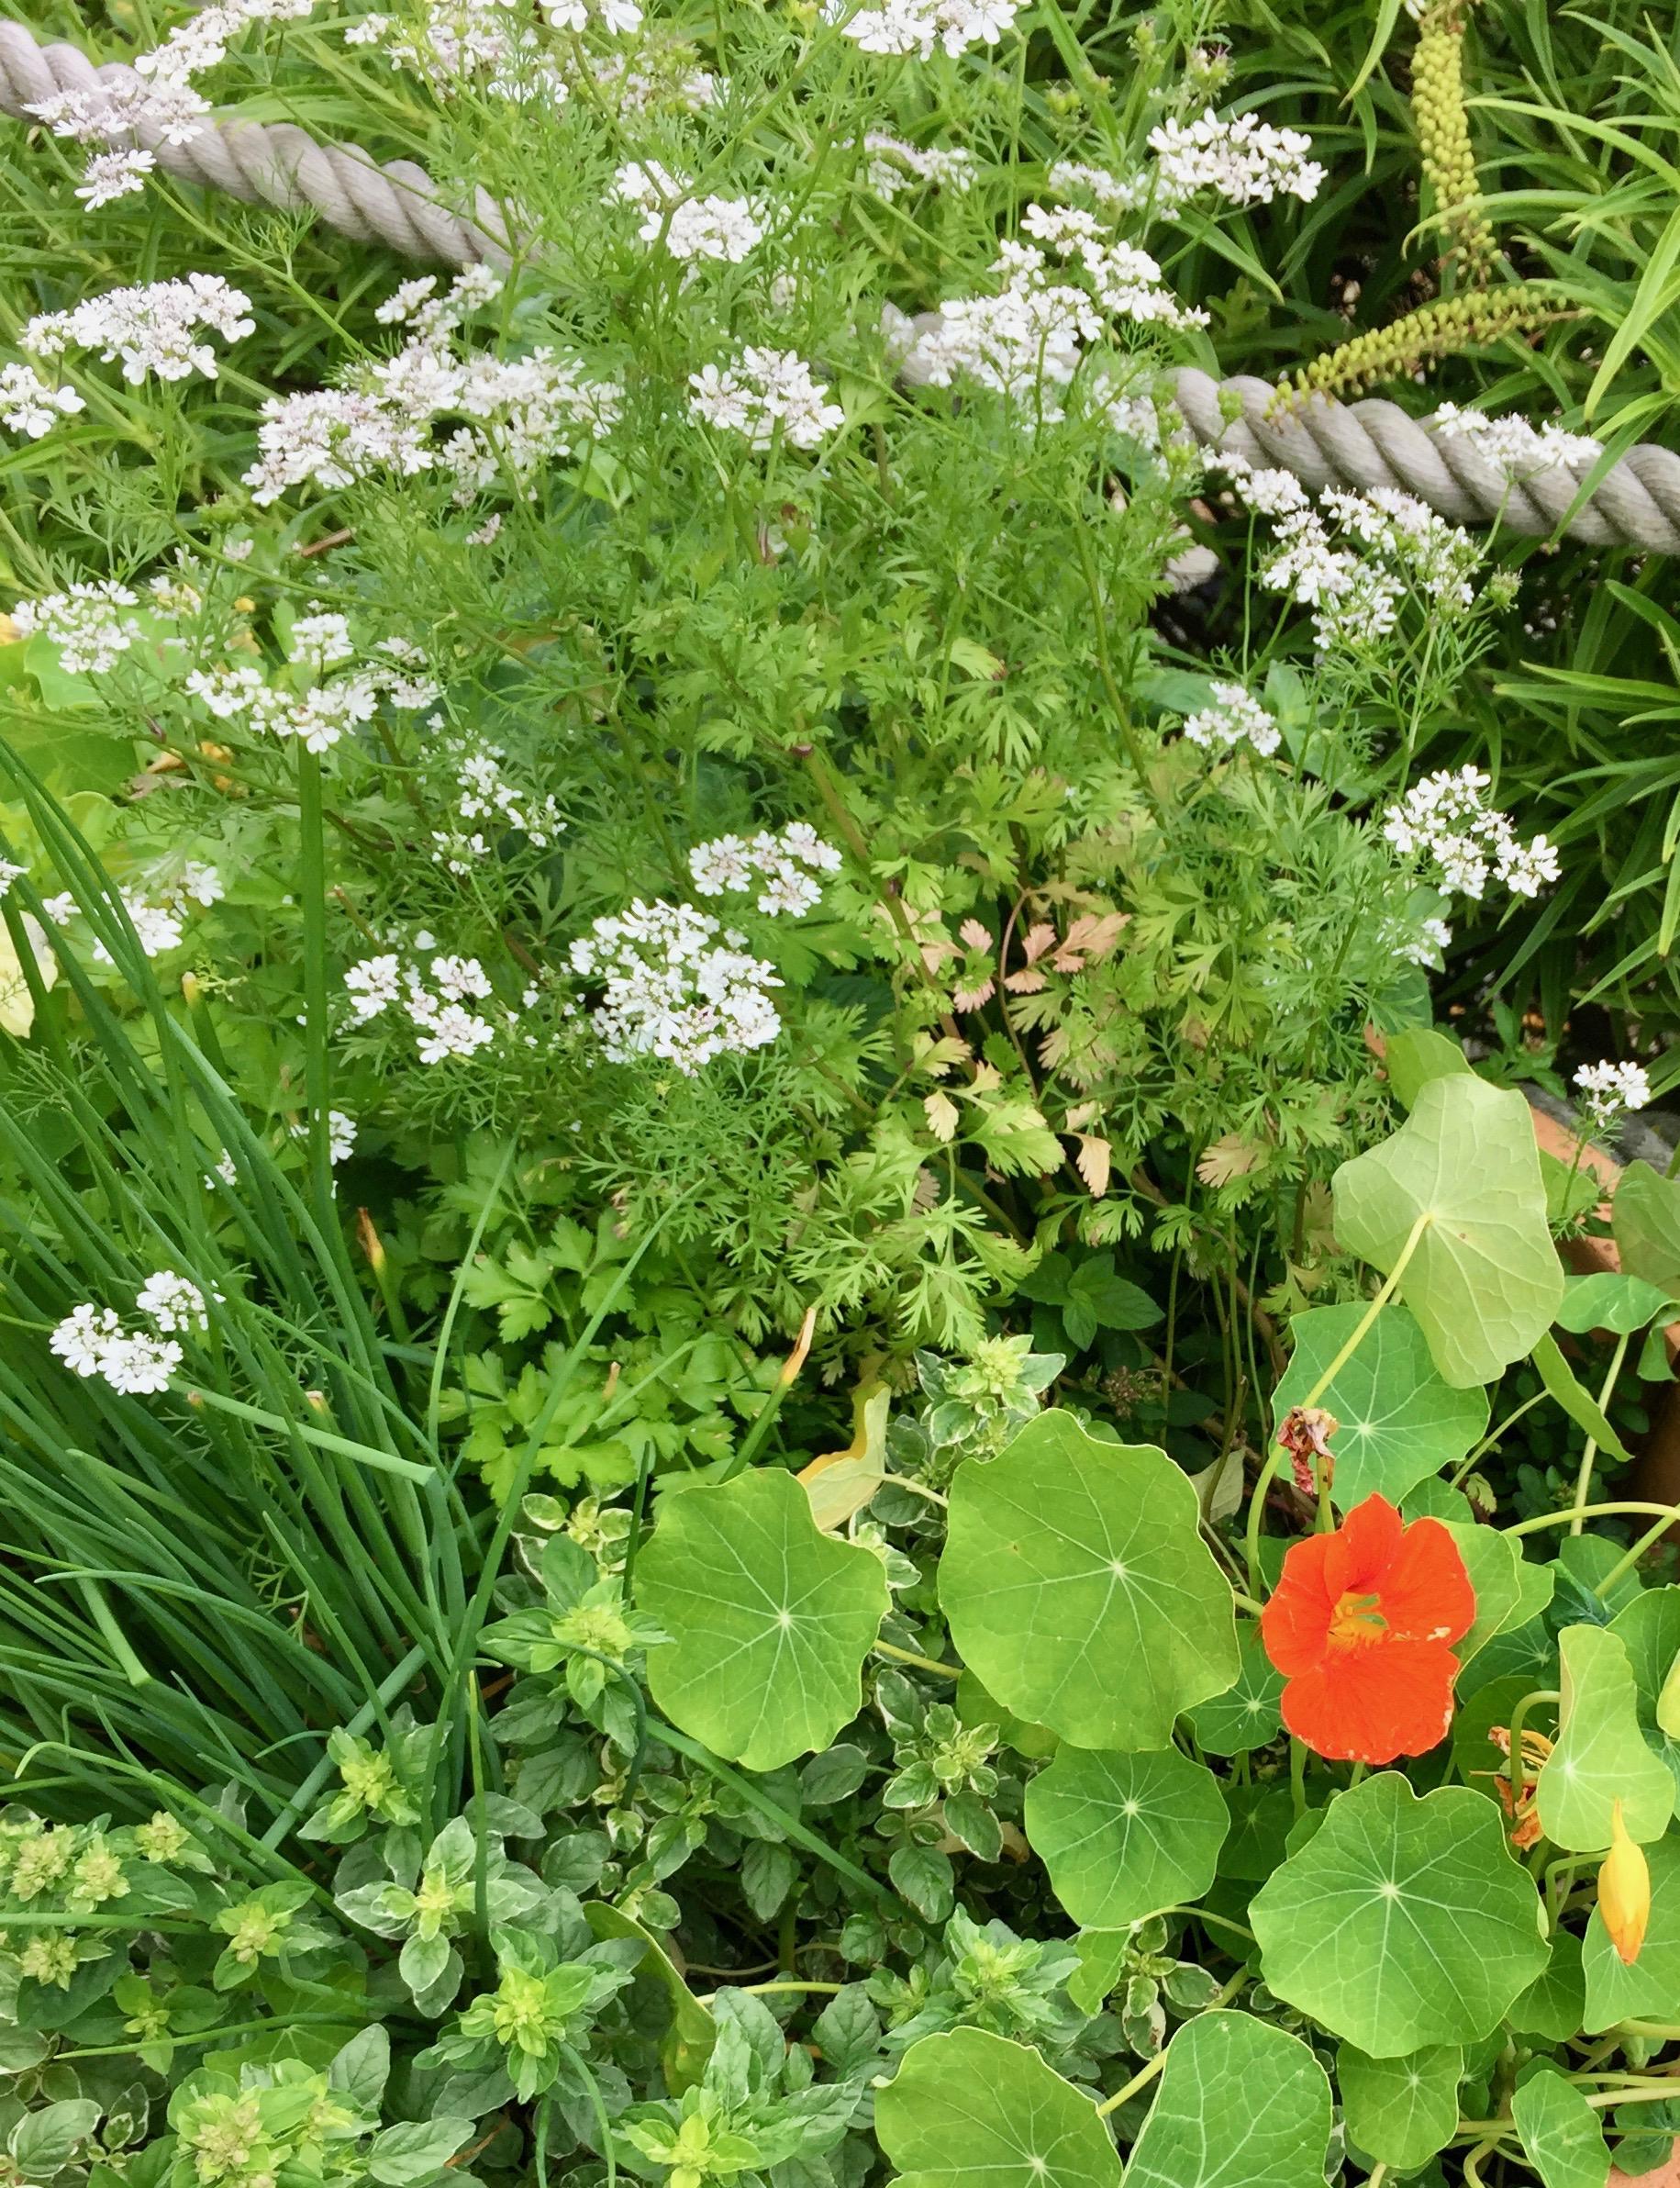 Edible nasturtiums growing in my herb pot.